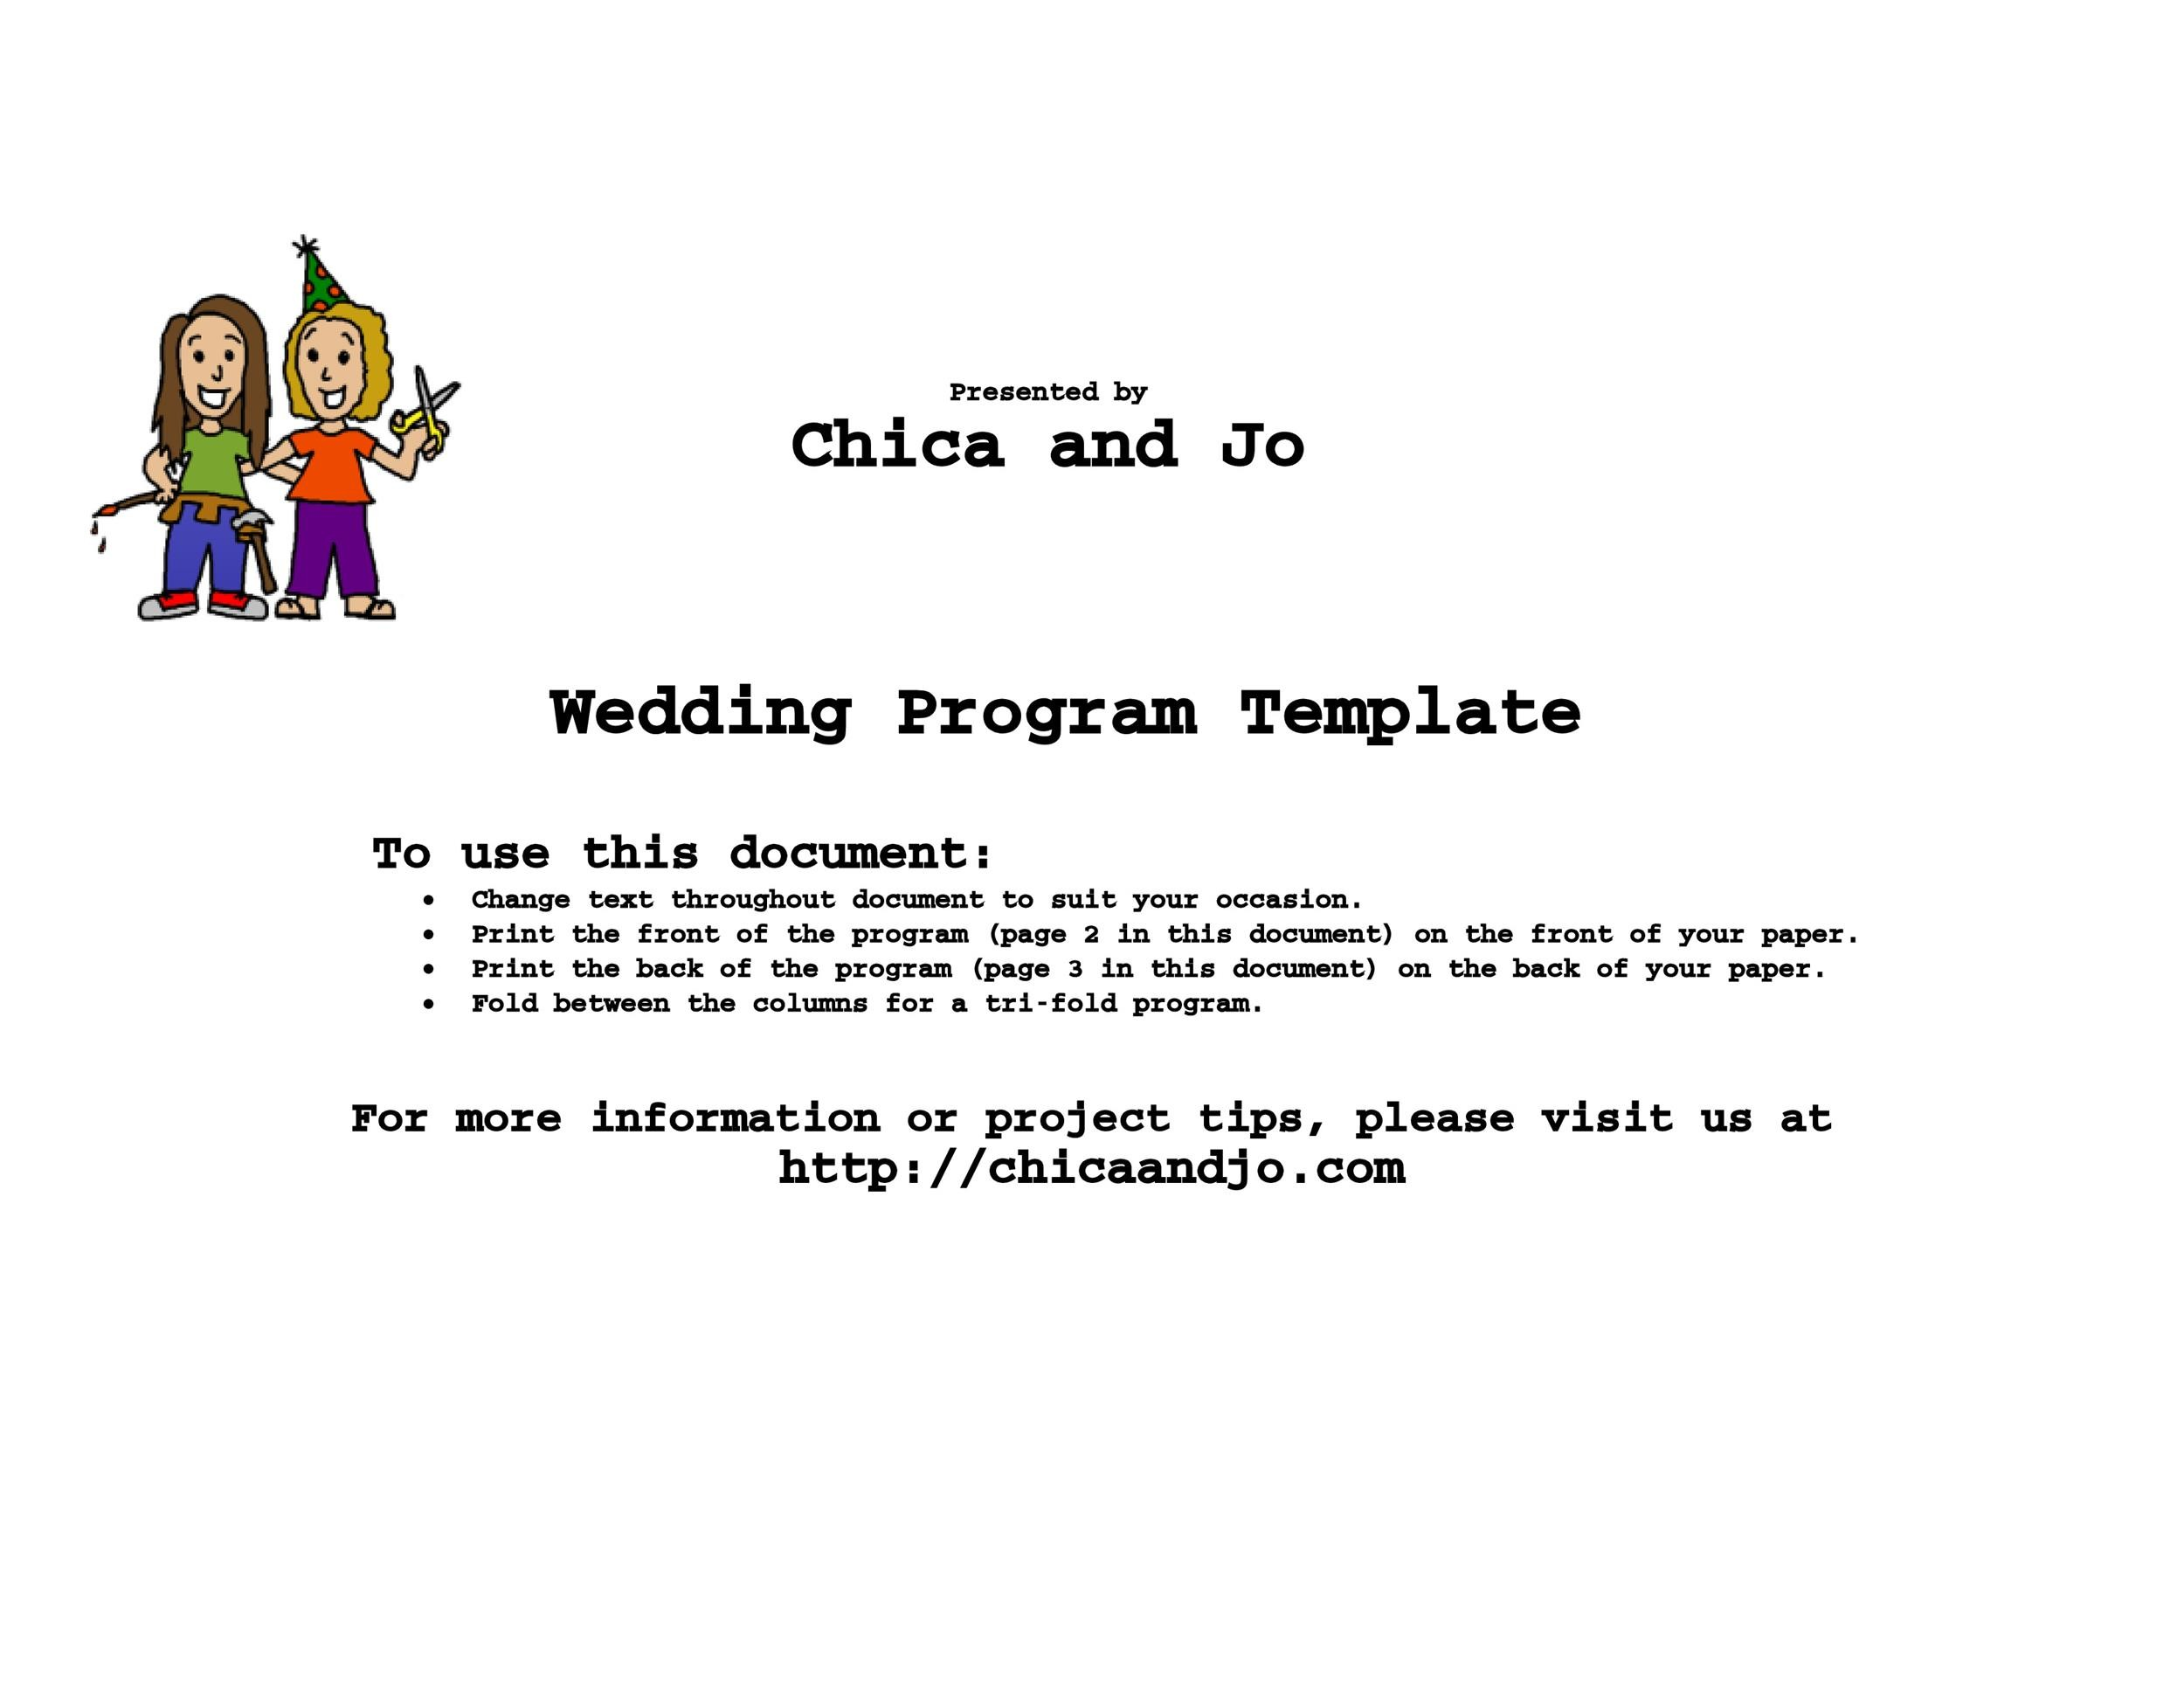 37 Printable Wedding Program Examples  Templates ᐅ Template Lab